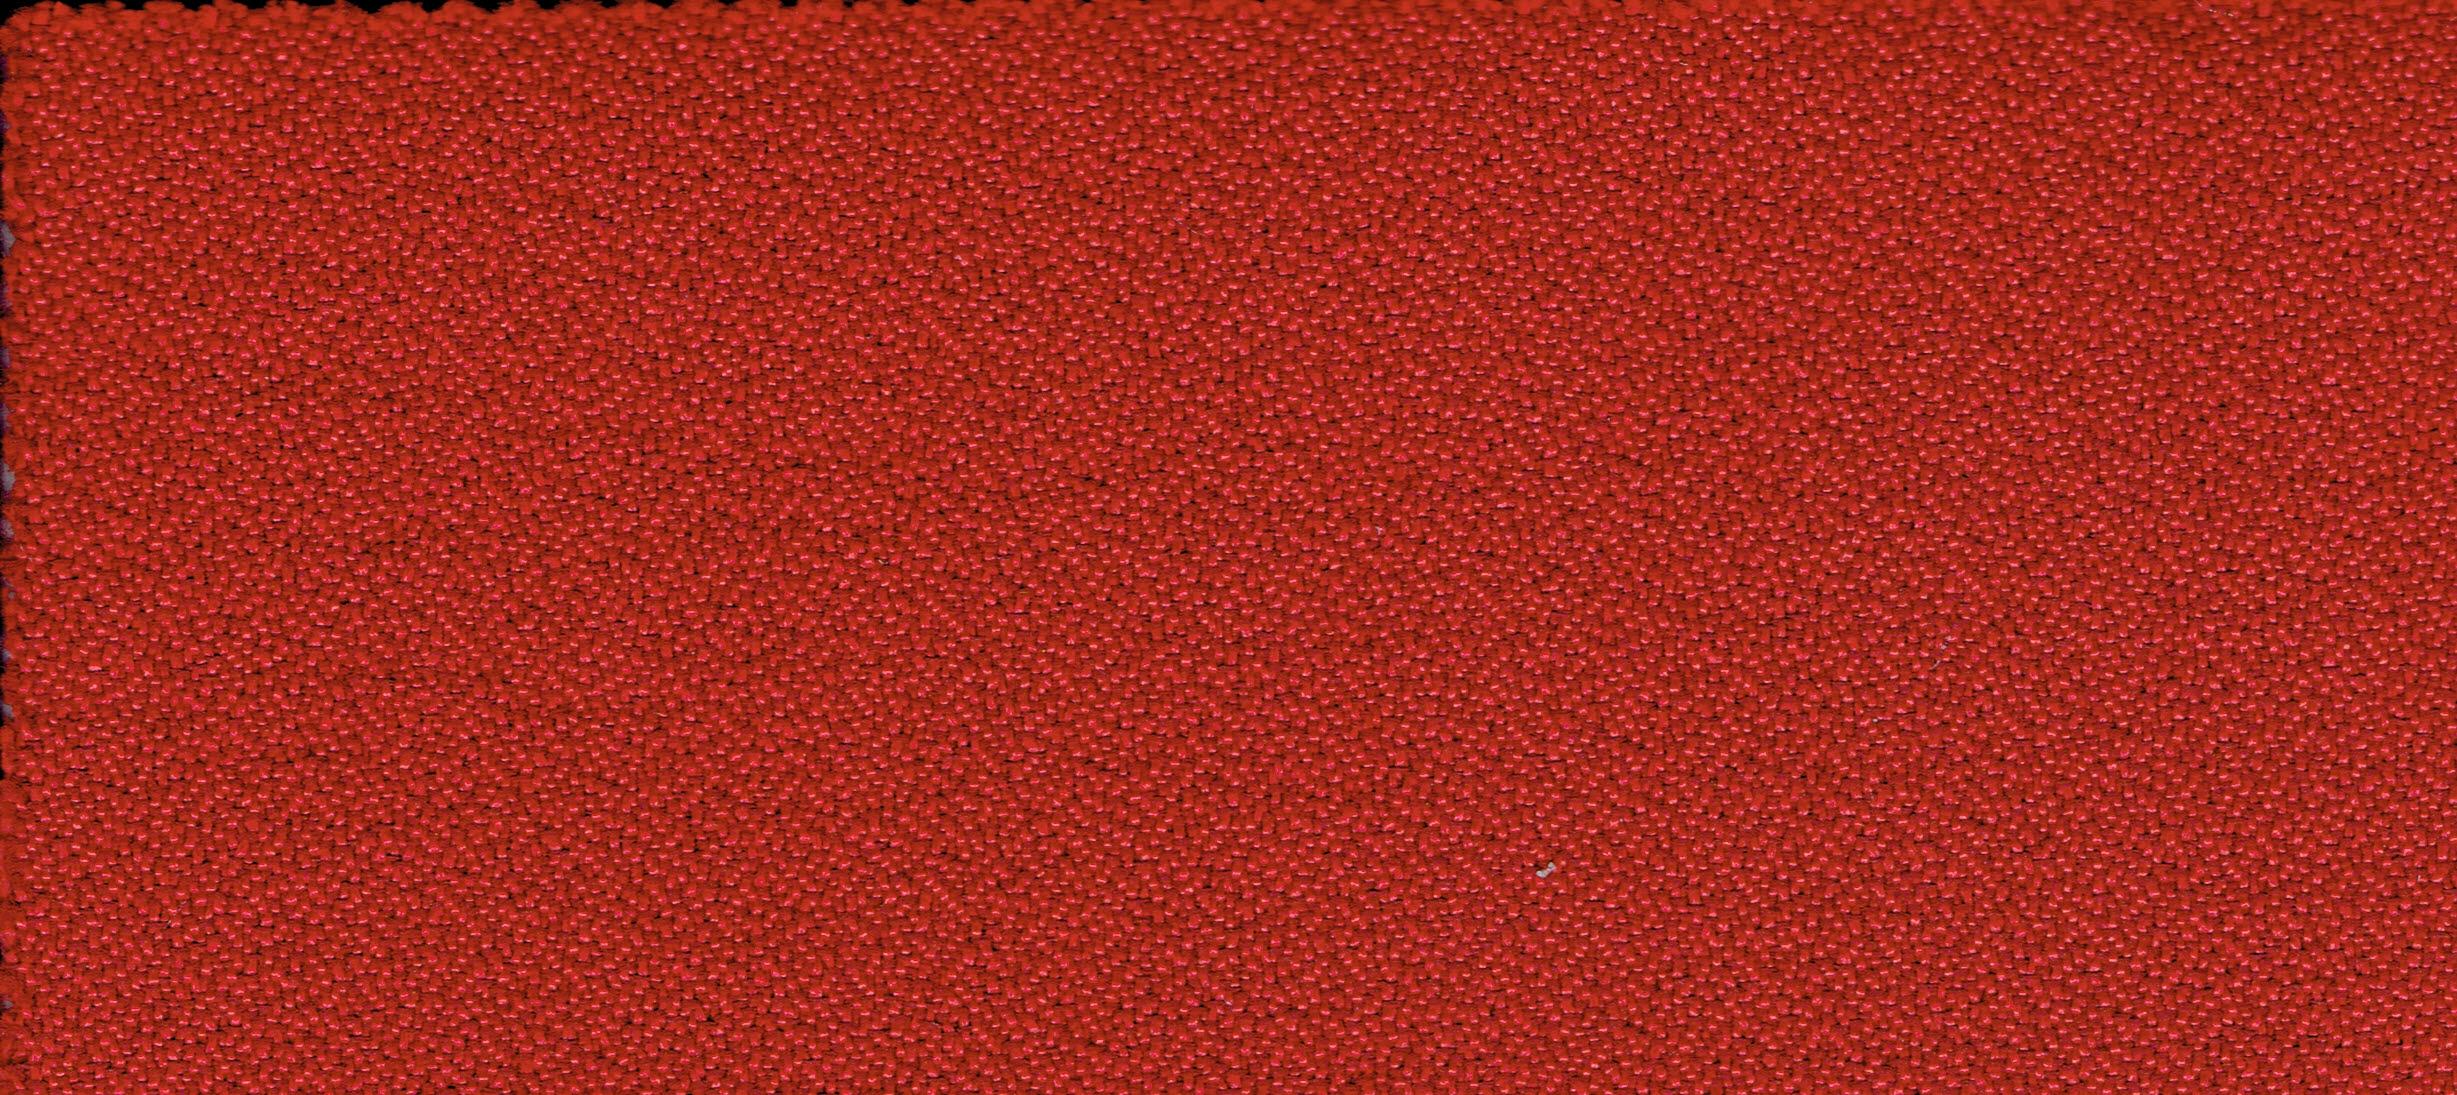 fabric26082015_0007.jpg